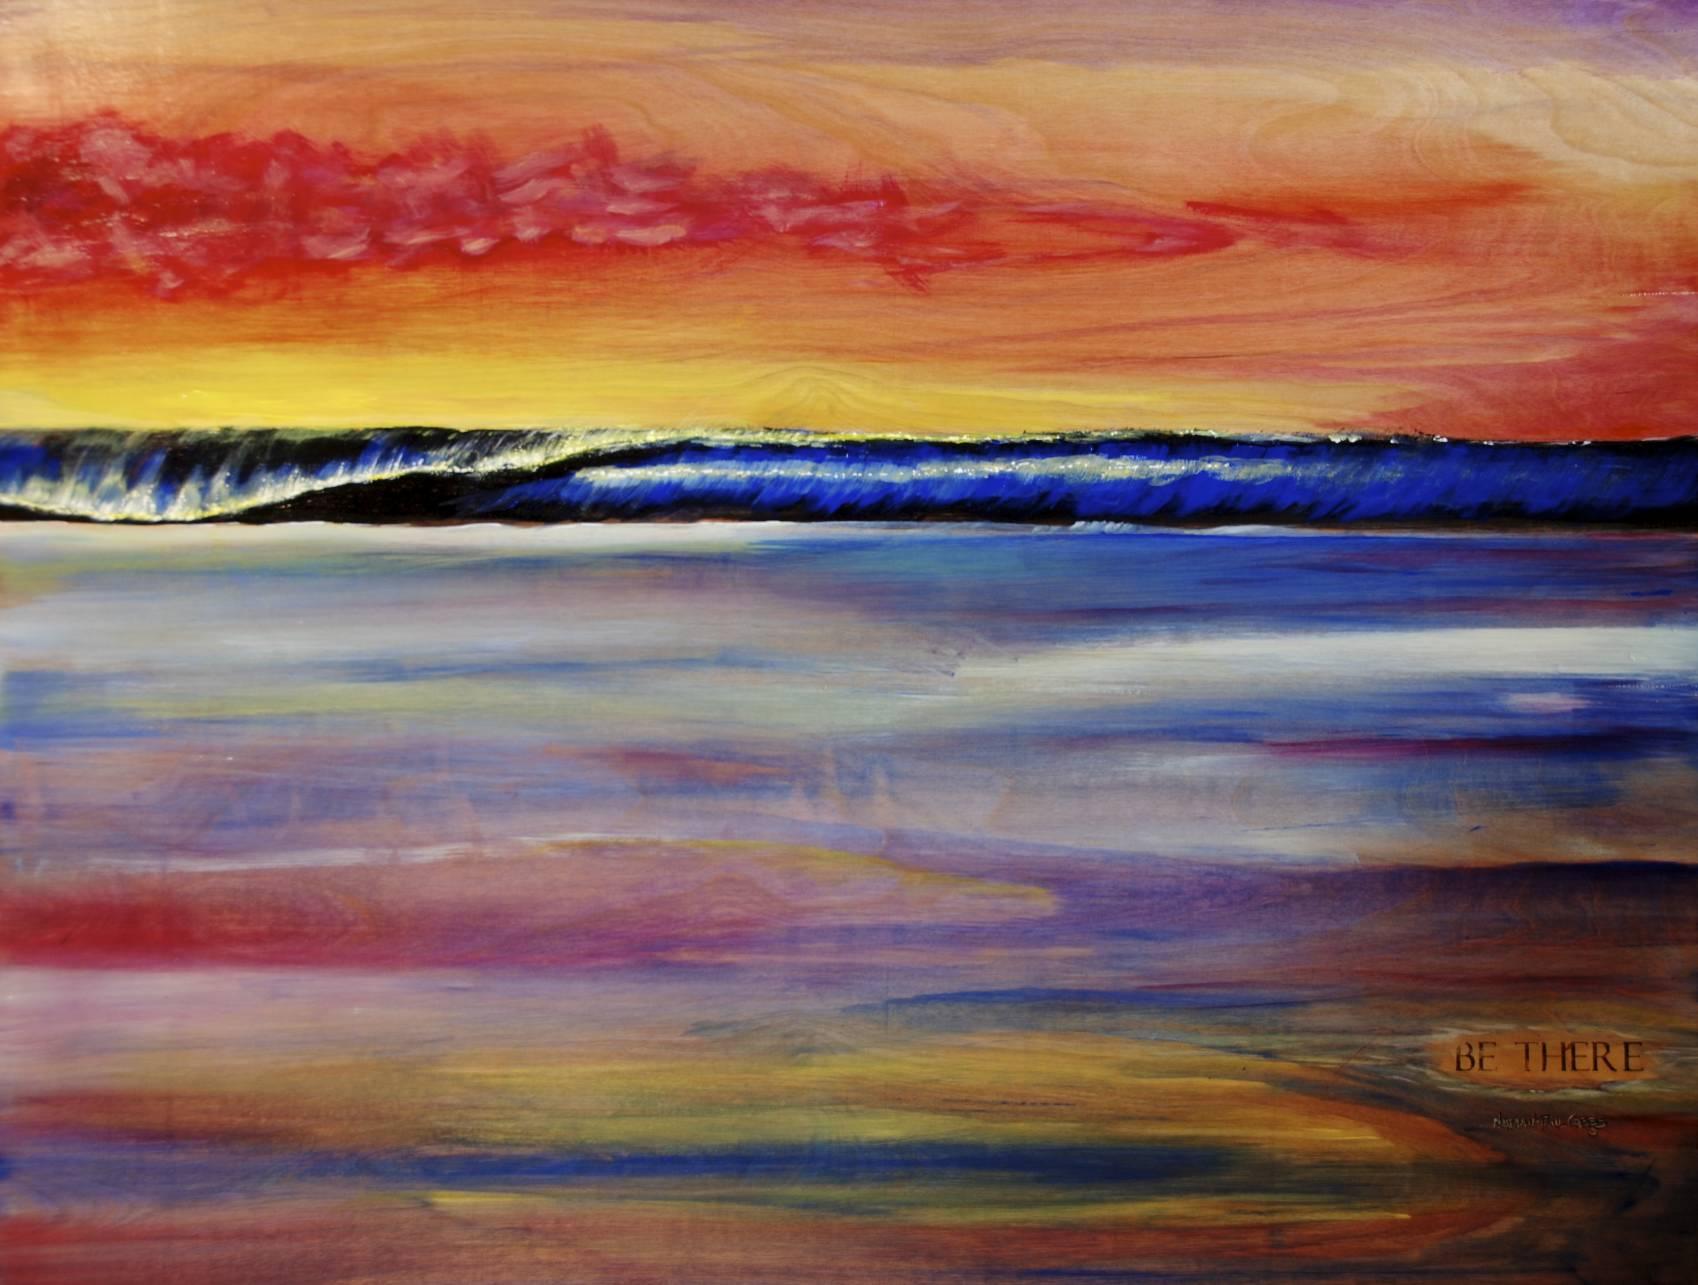 Be There_Surf_Art_Nathan_Gibbs.jpg